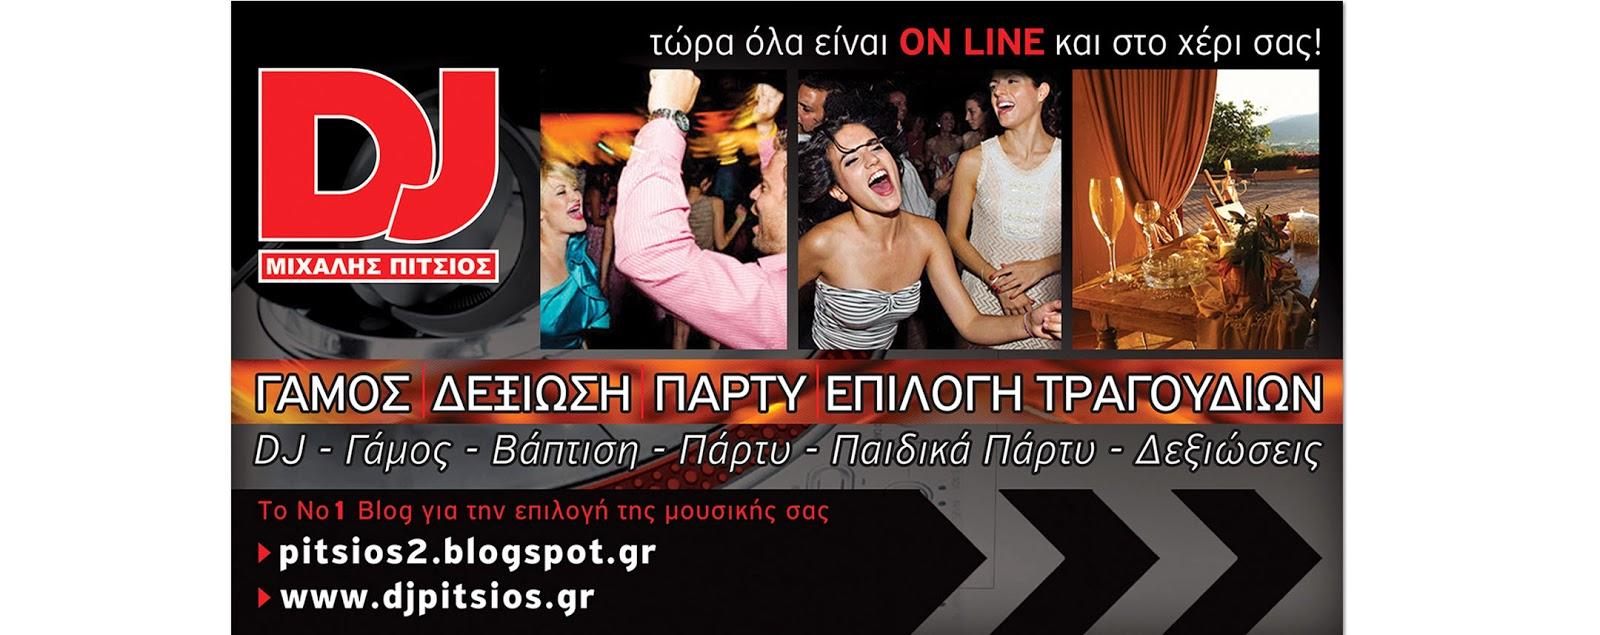 http://pitsios2.blogspot.gr/